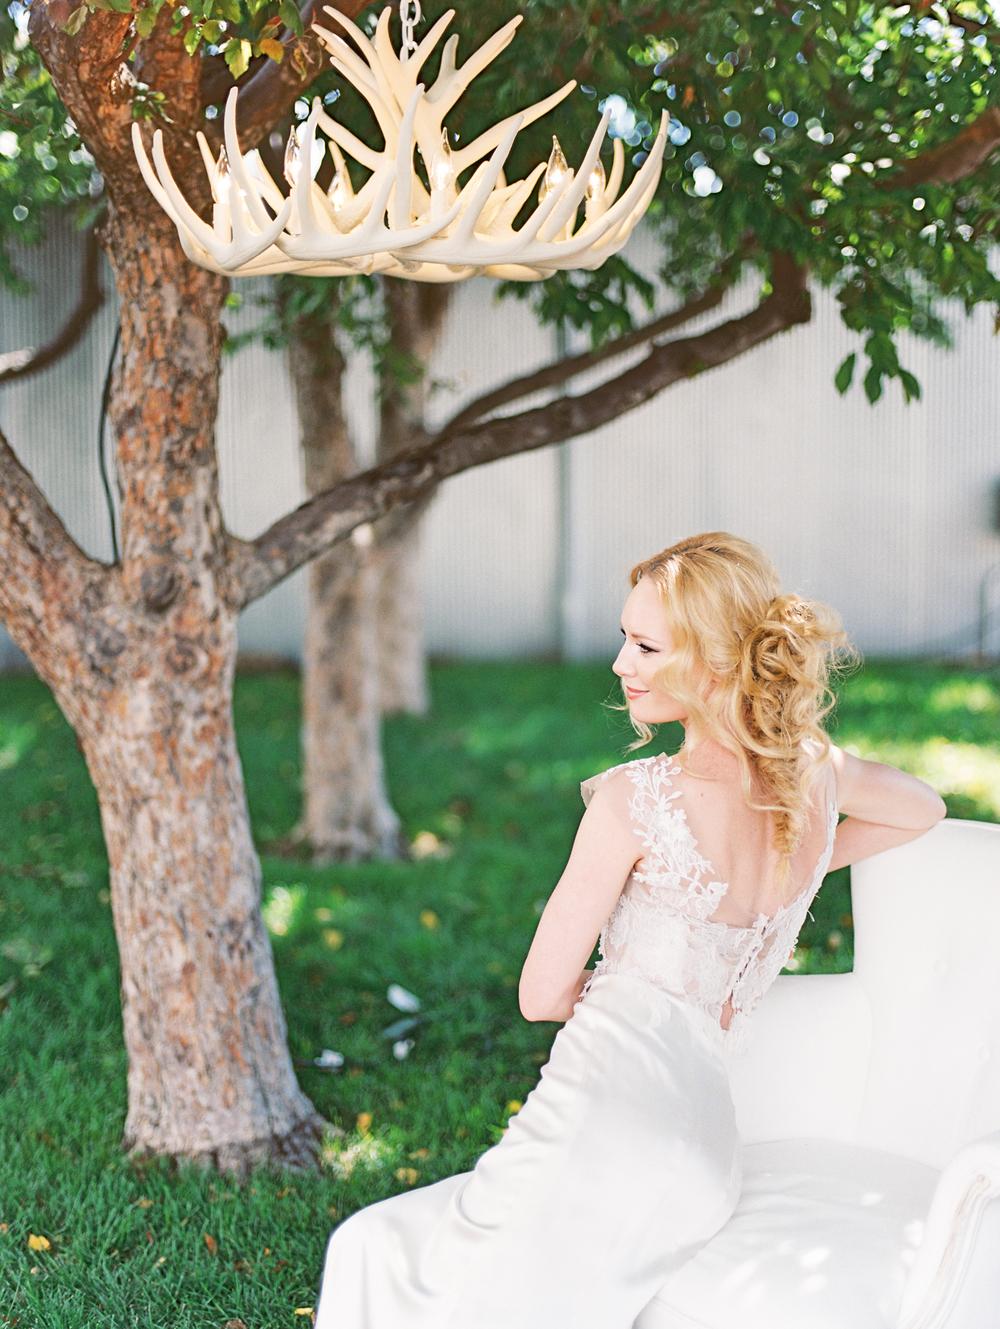 Blanc-Denver-wedding-inspiration-by-Lisa-O'Dwyer-Denver-fine-art-wedding-photographer-45.jpg